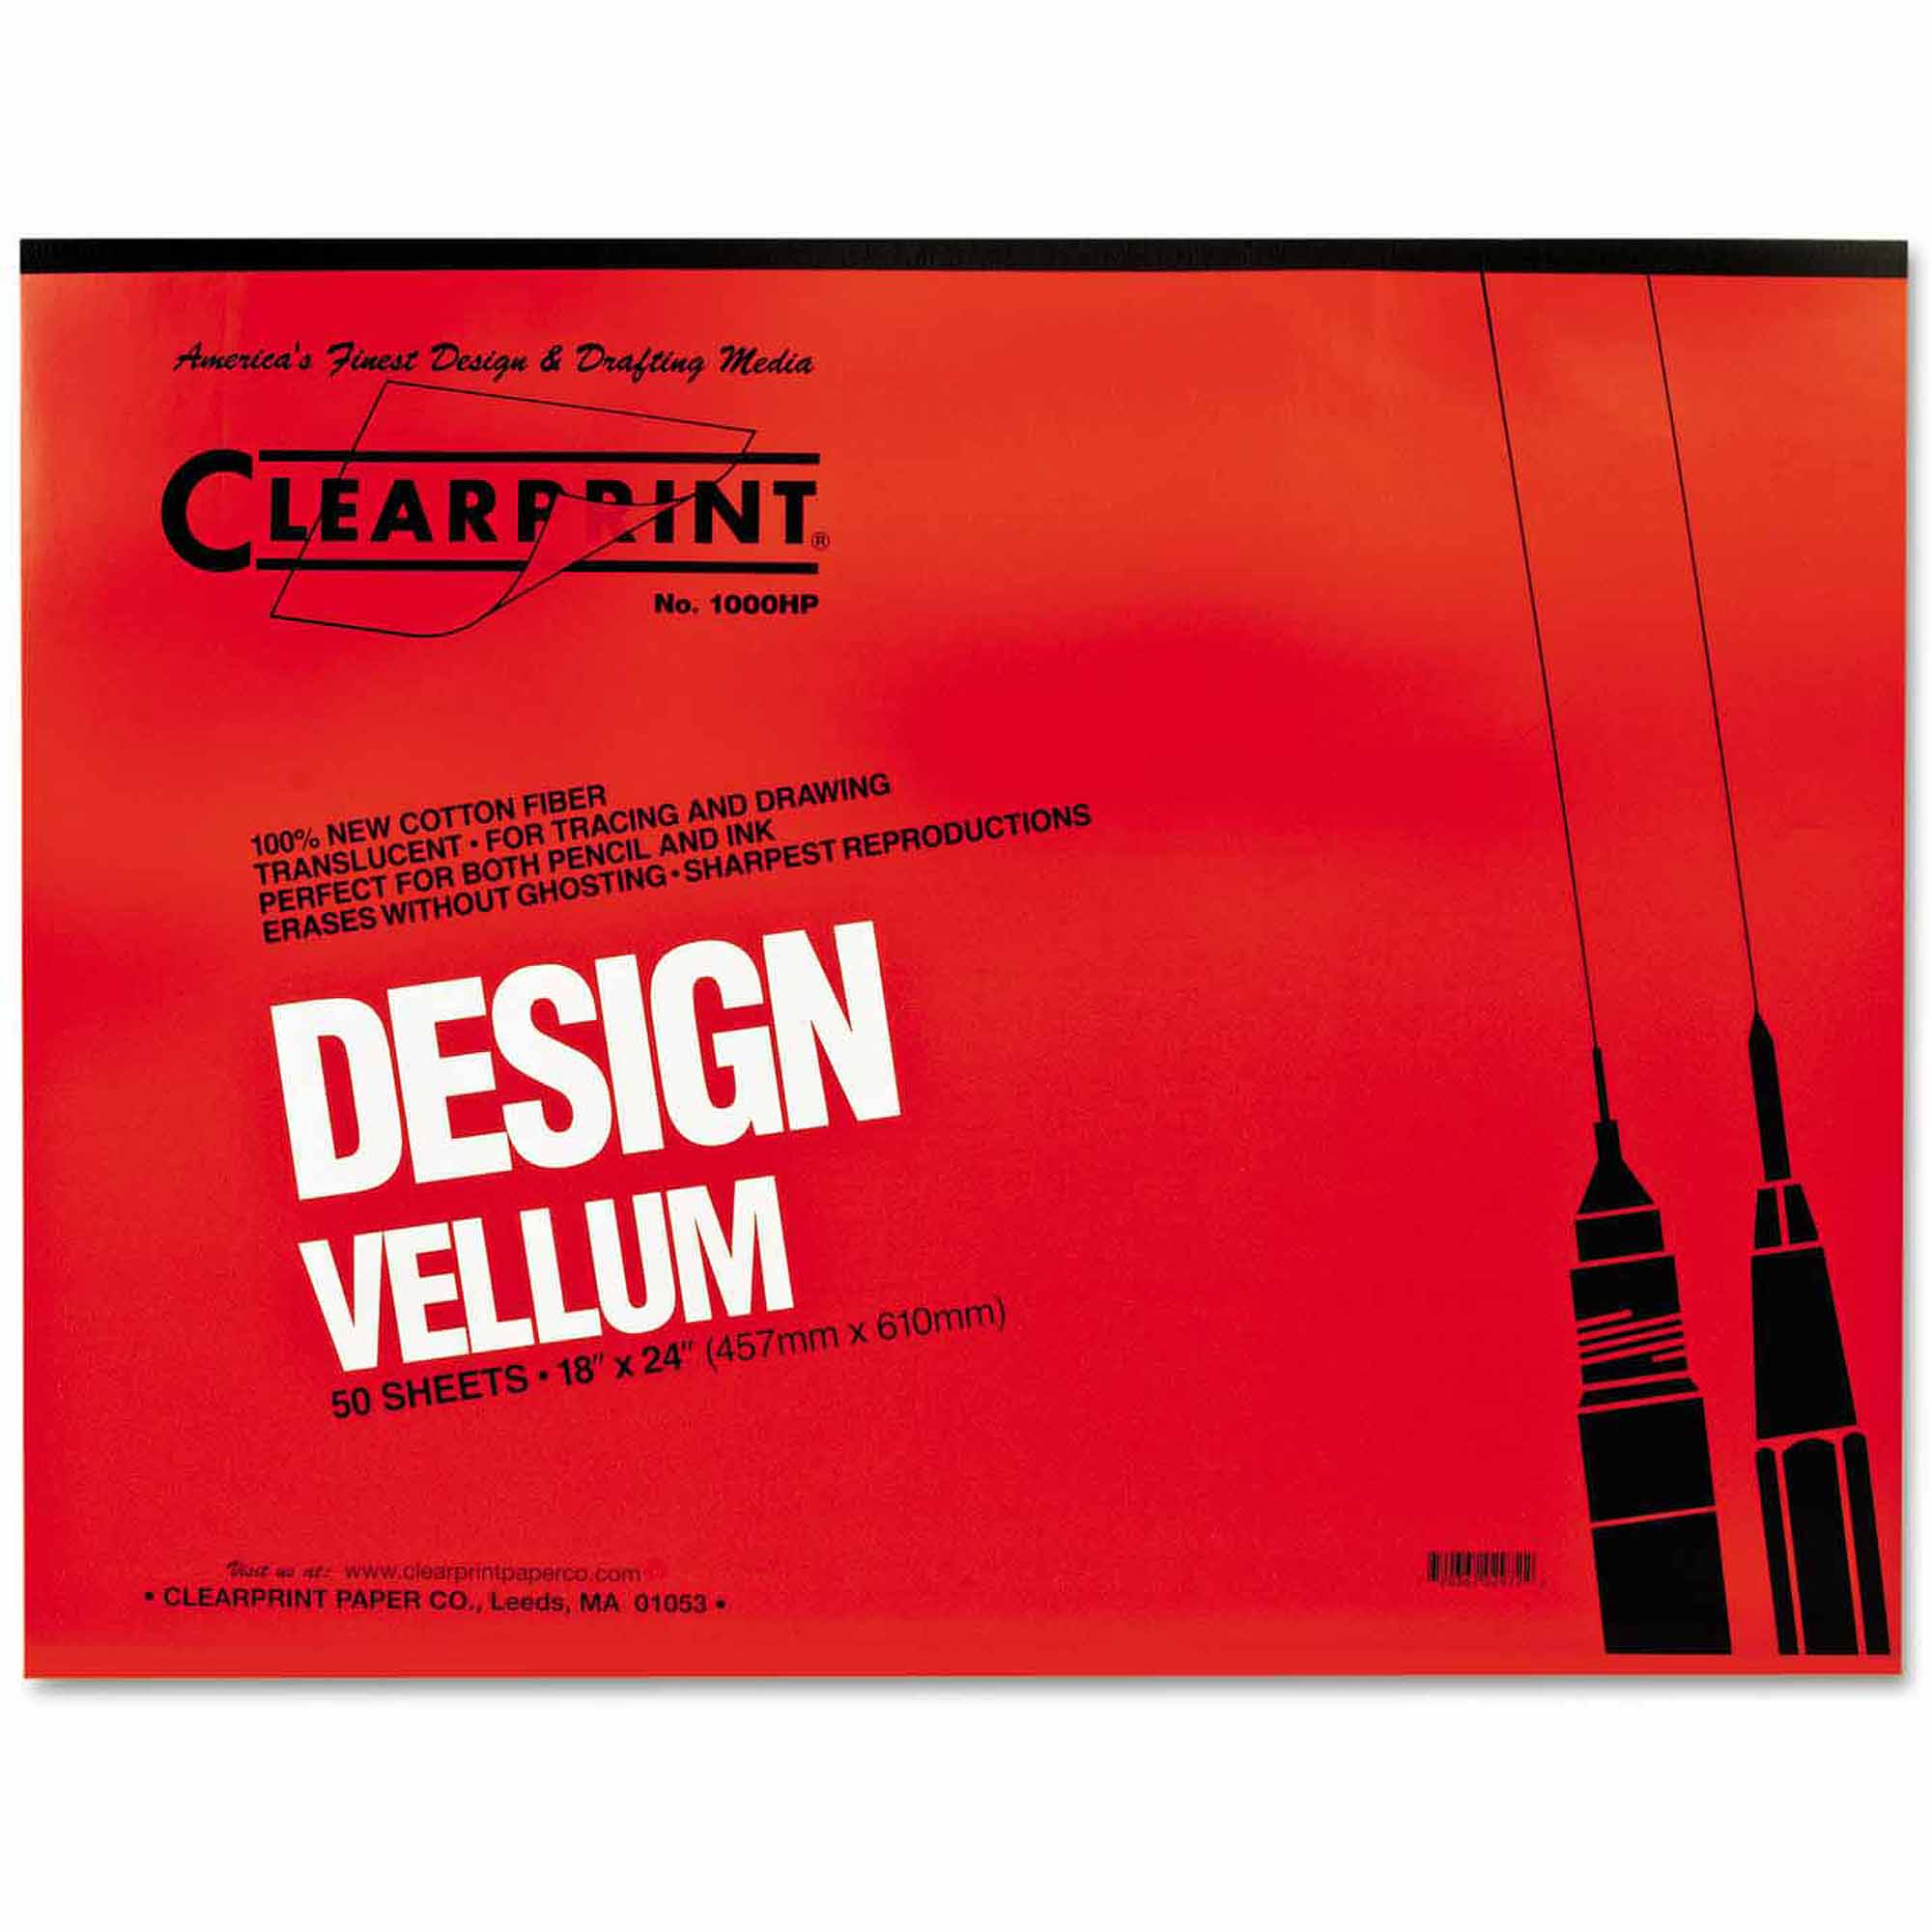 "Clearprint Design Vellum Paper, 16 lbs, White, 18"" x 24"", 50 Sheets/Pad"